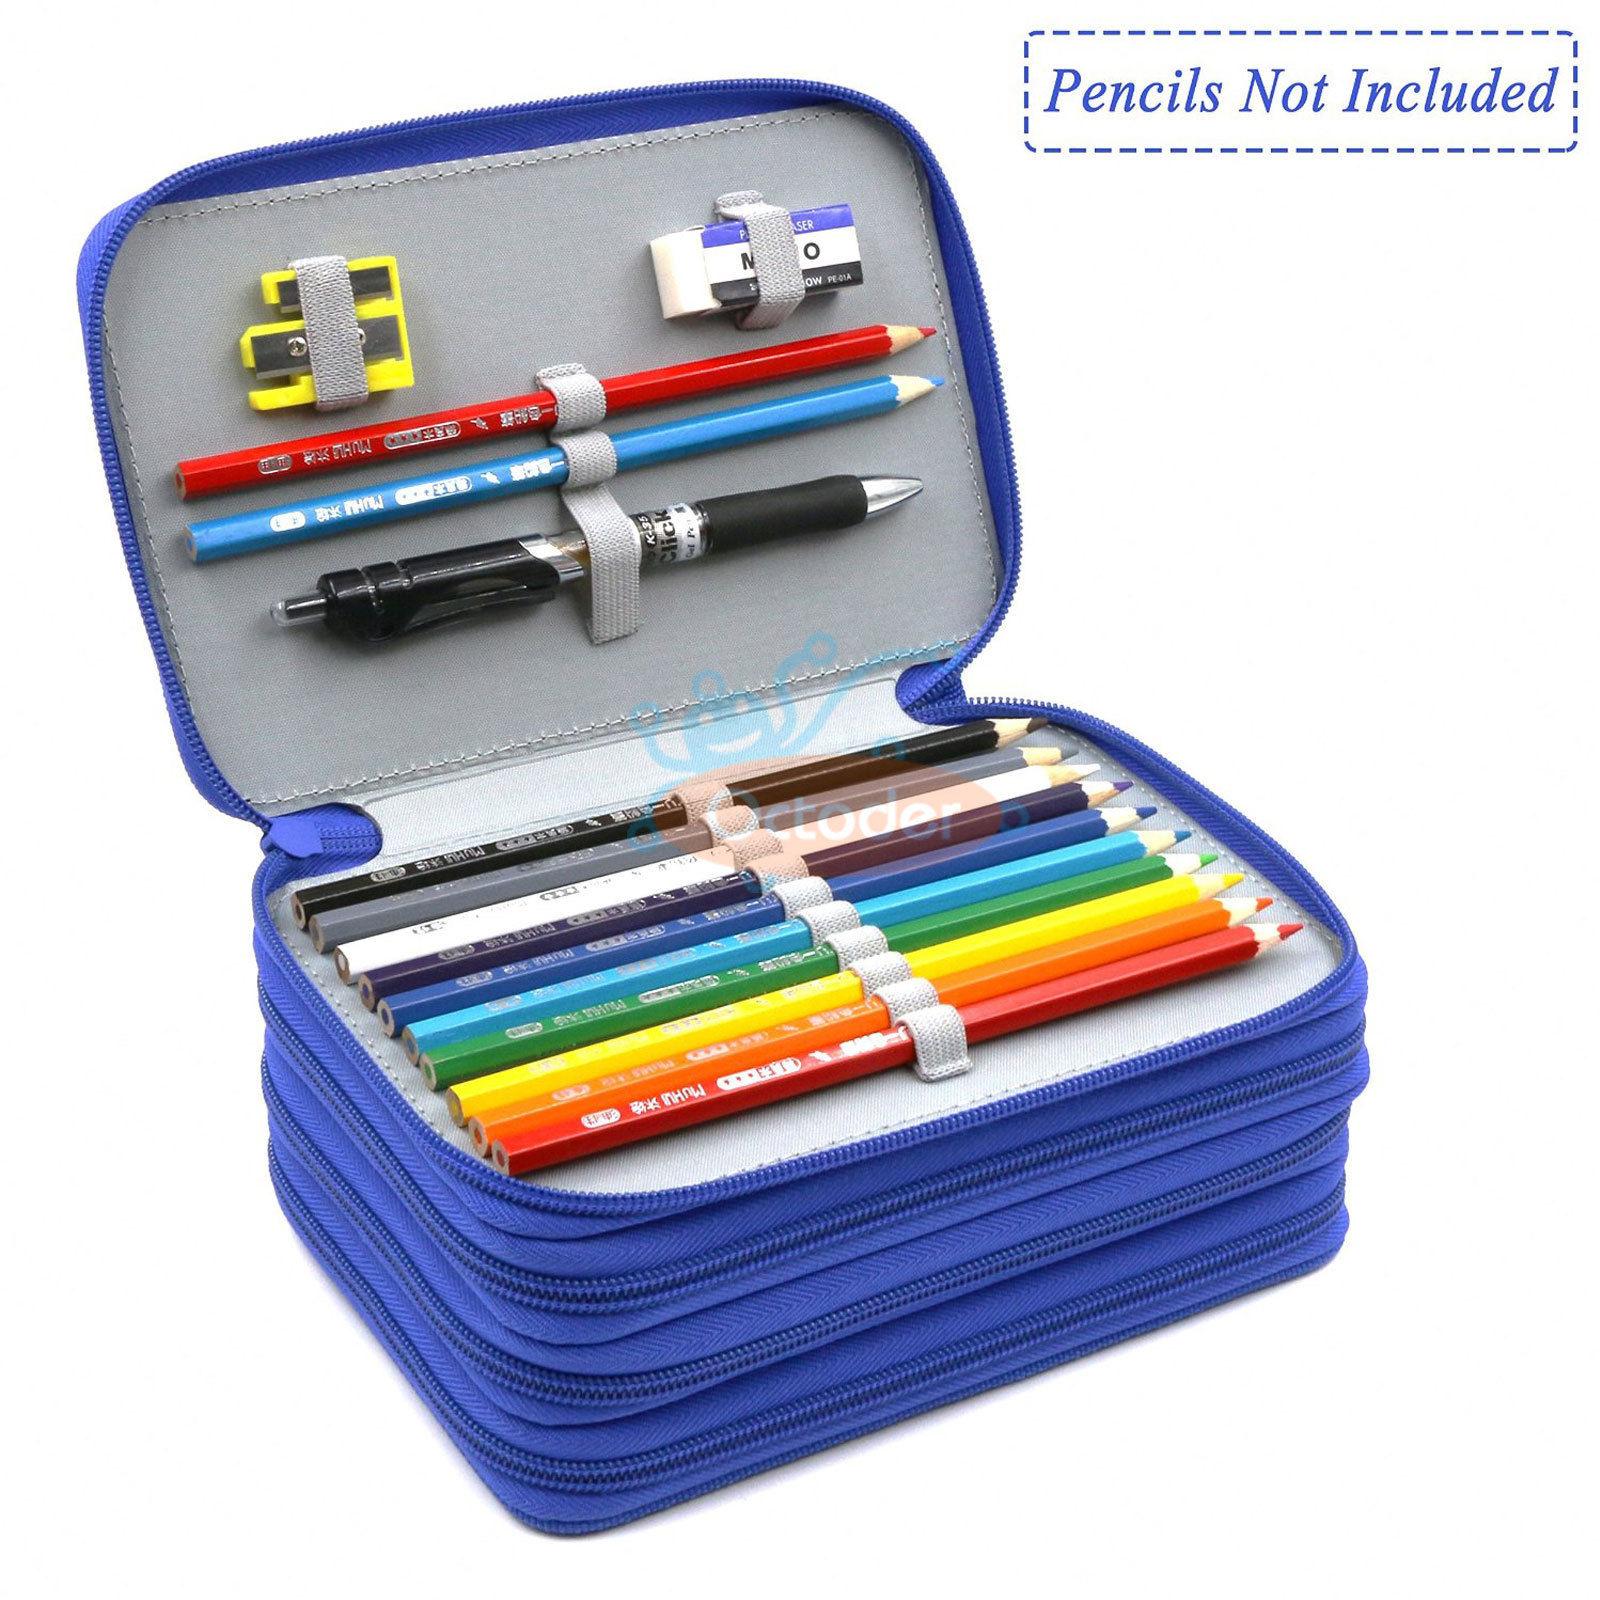 4-Layers-High-Capacity-Pencil-Brush-Case-Box-Pen-Pouch-Bag-Makeup-Storage-Bag thumbnail 13